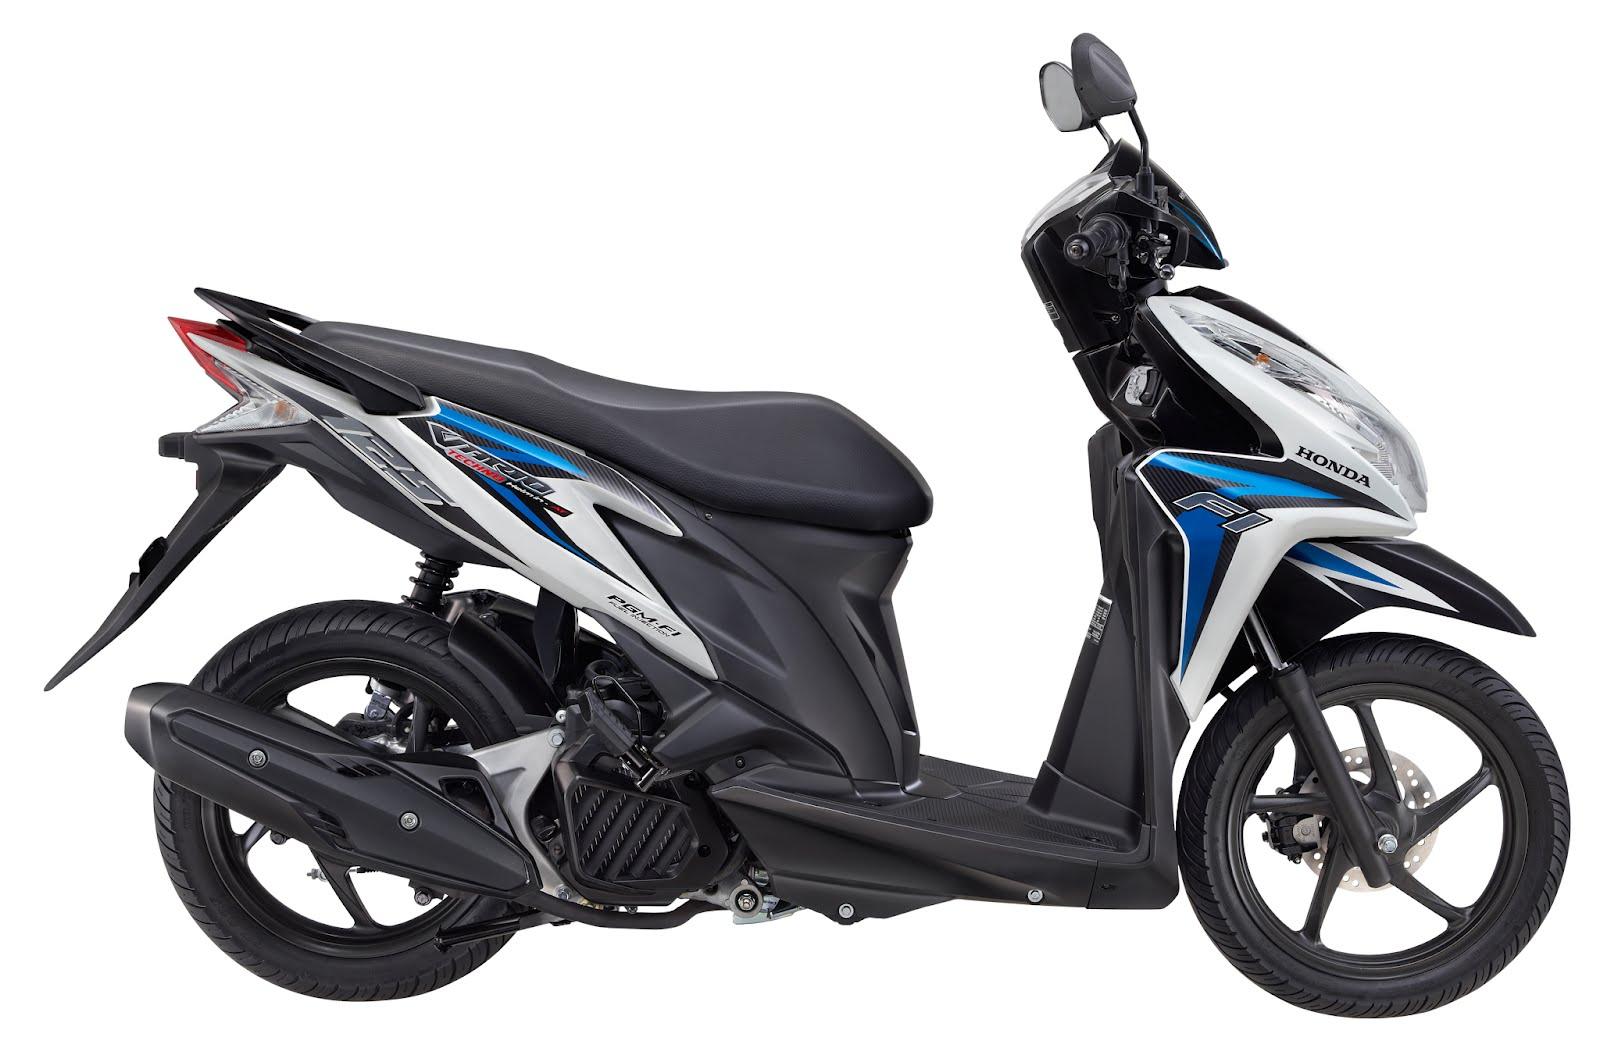 Fitur Motor Honda Vario Techno Pgm Fi Artikel Indonesia Kumpulan